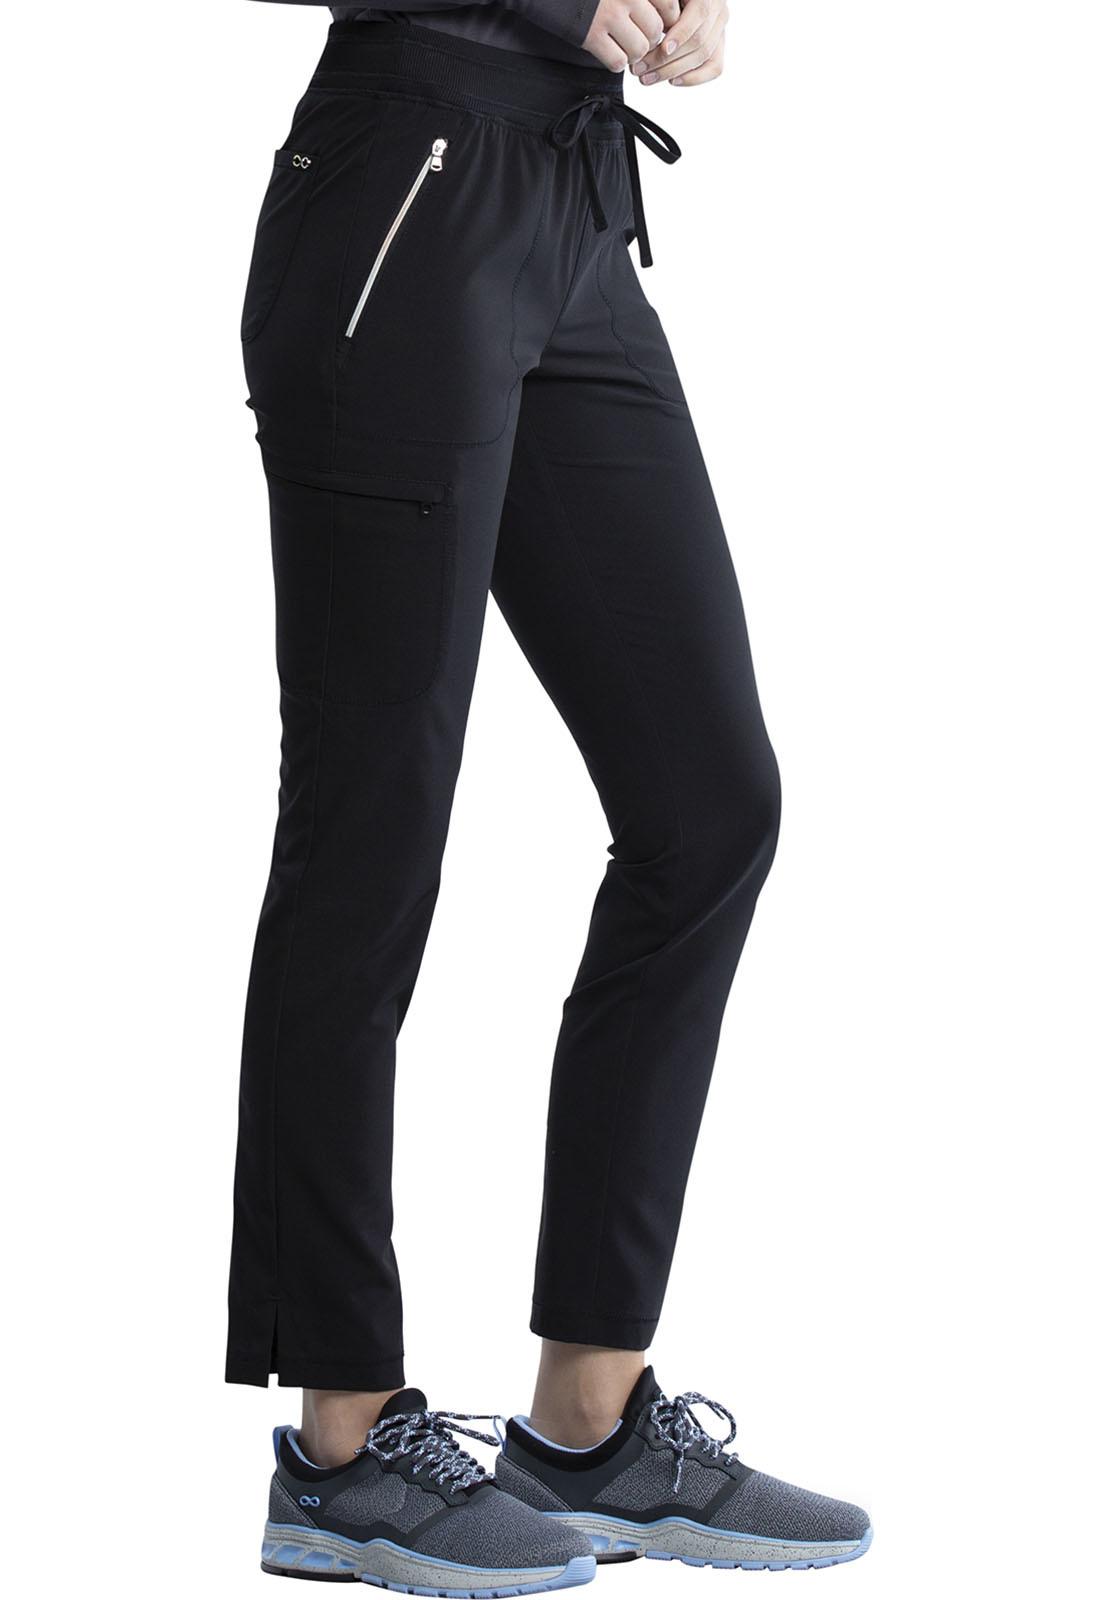 CHEROKEE Pull-on Pants Black CK135A-BAPS-XL